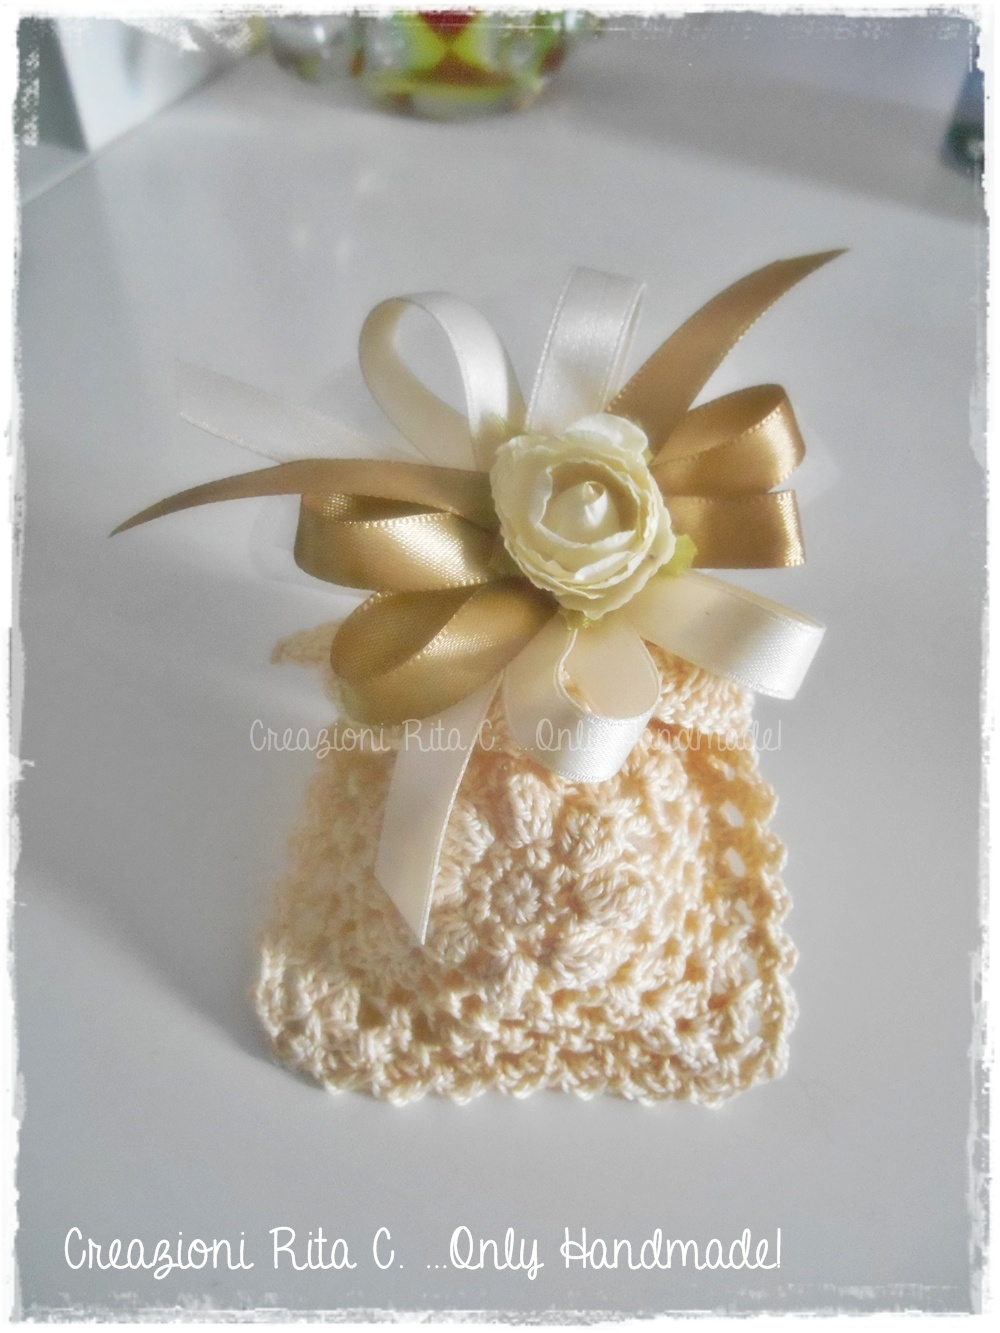 Matrimonio Tema Uncinetto : Creazioni rita c only handmade